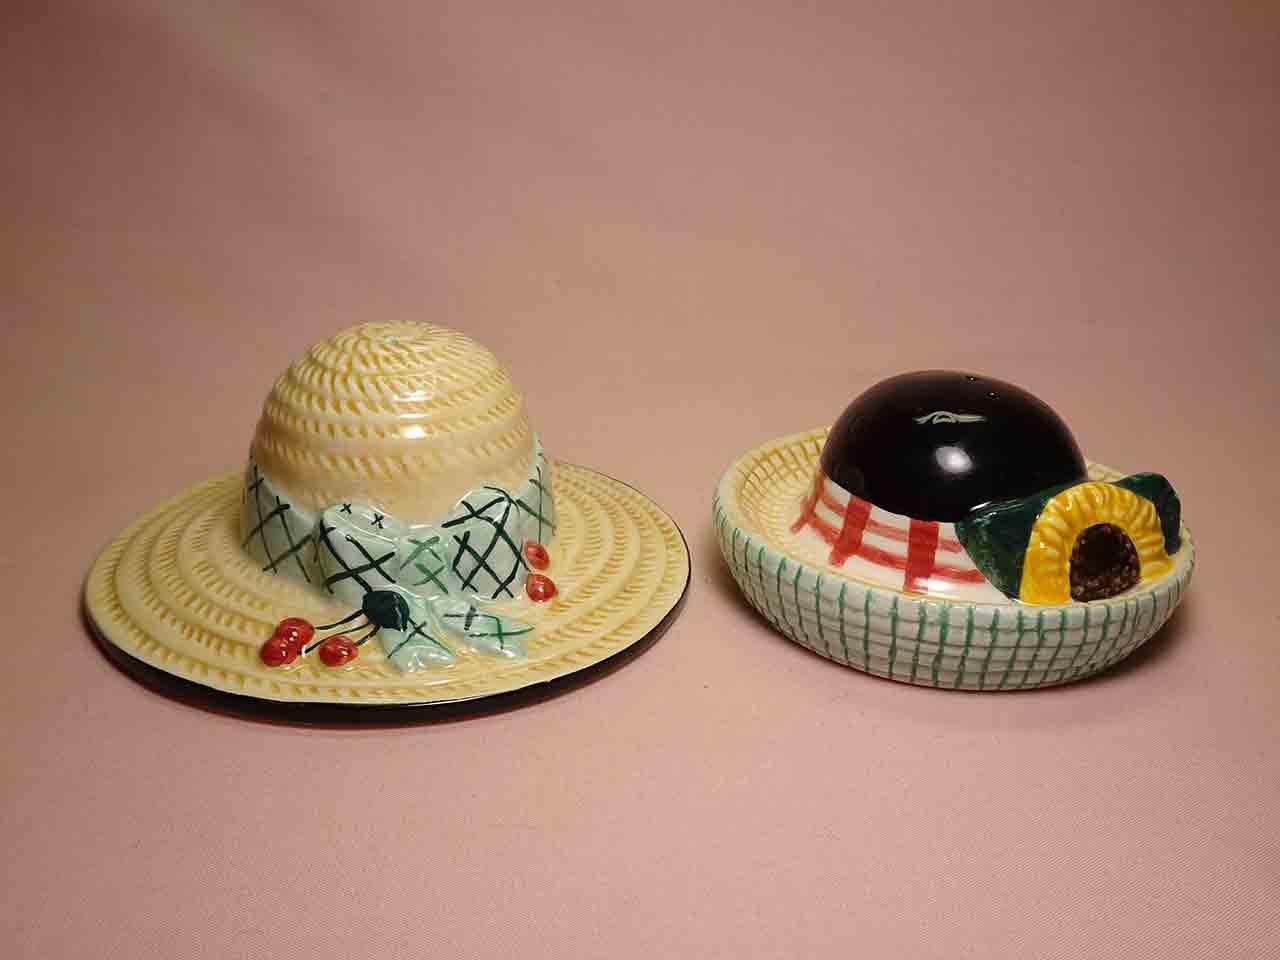 Vandor household items salt and pepper shakers - ladies' gardening hats